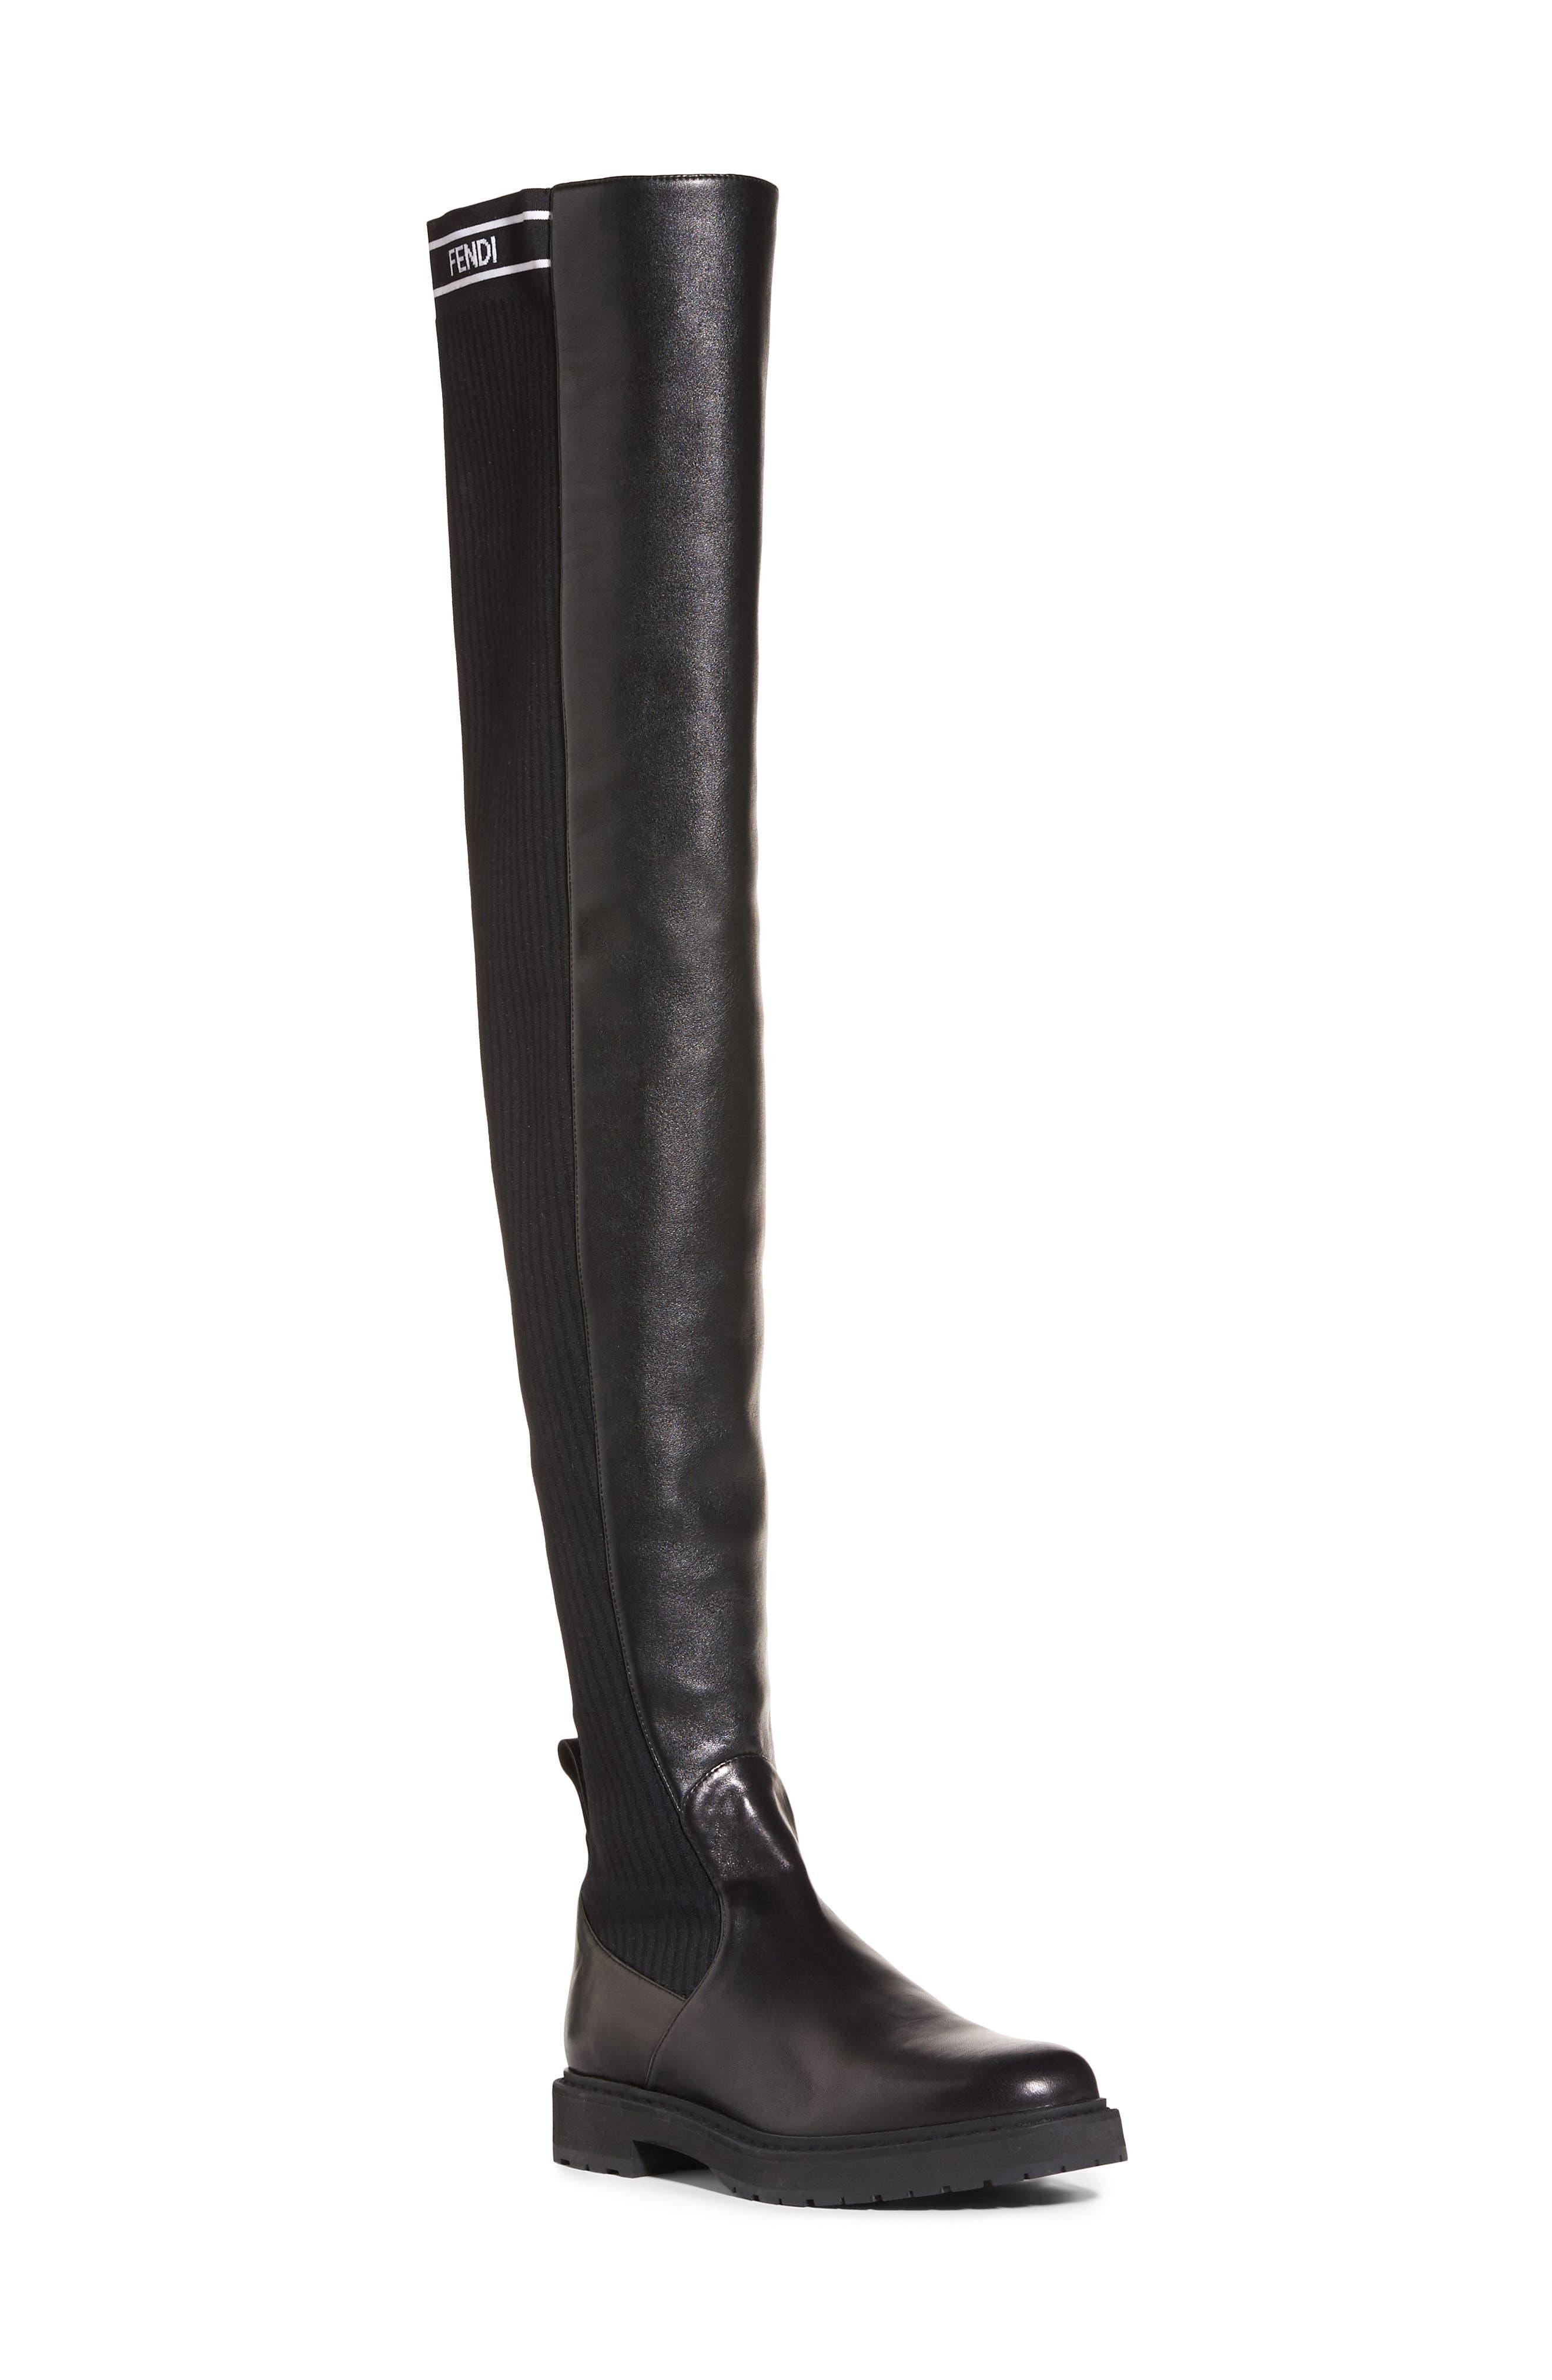 Main Image - Fendi Logo Over the Knee Boot (Women)